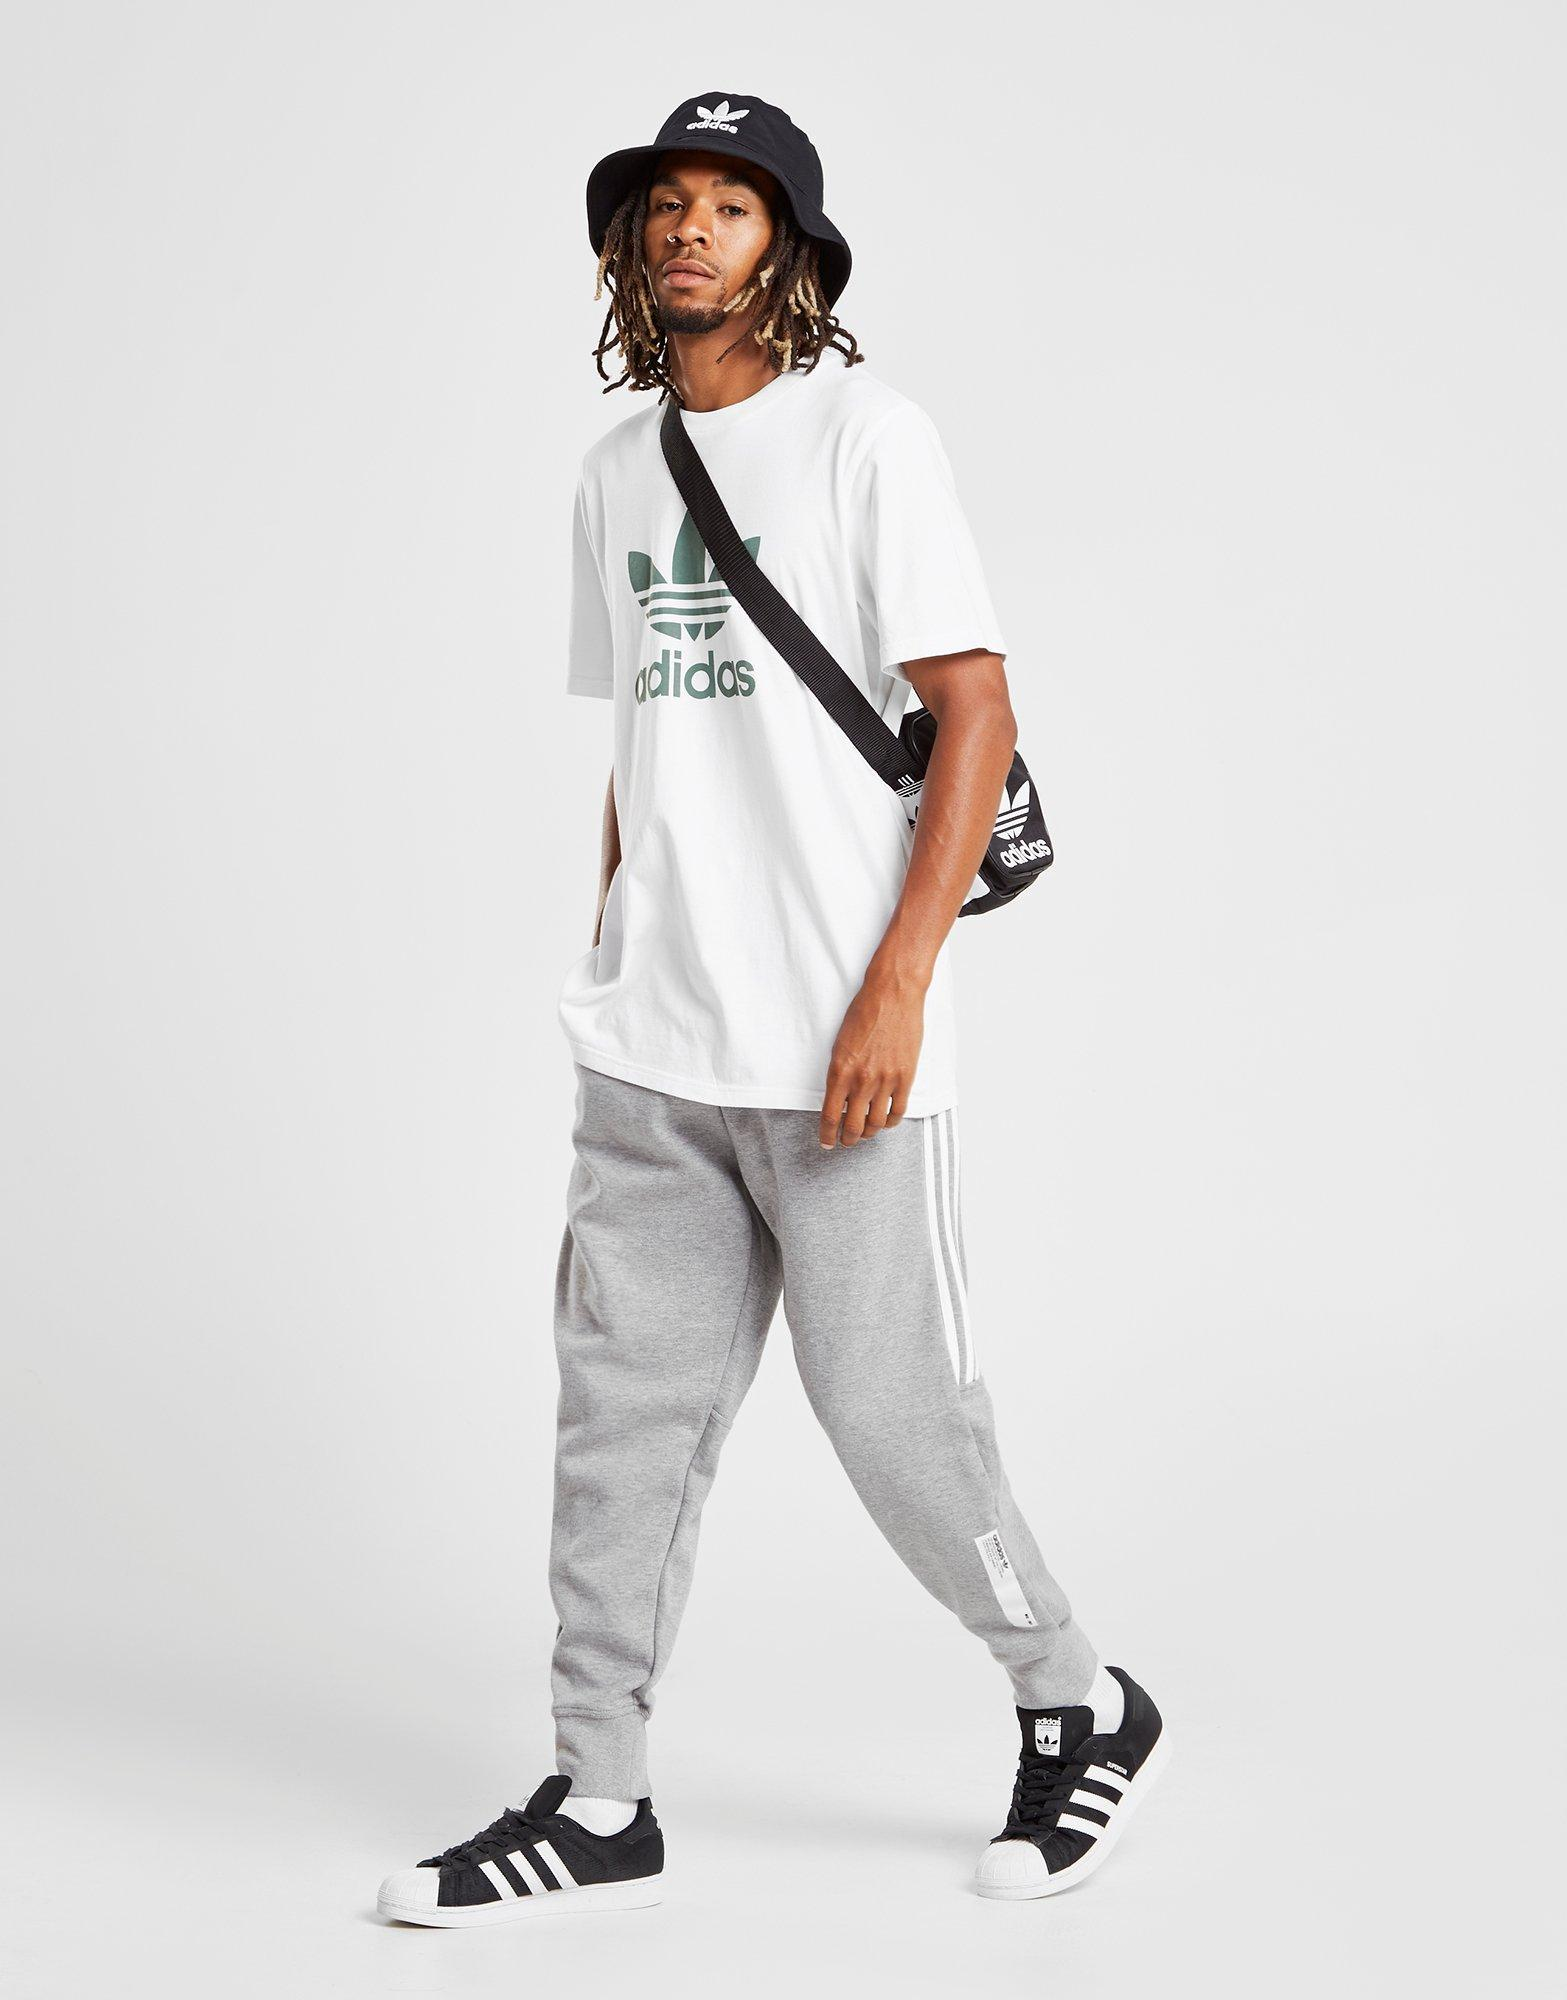 Adidas Originals California Mens Sports Casual Tee Shirt Tinley